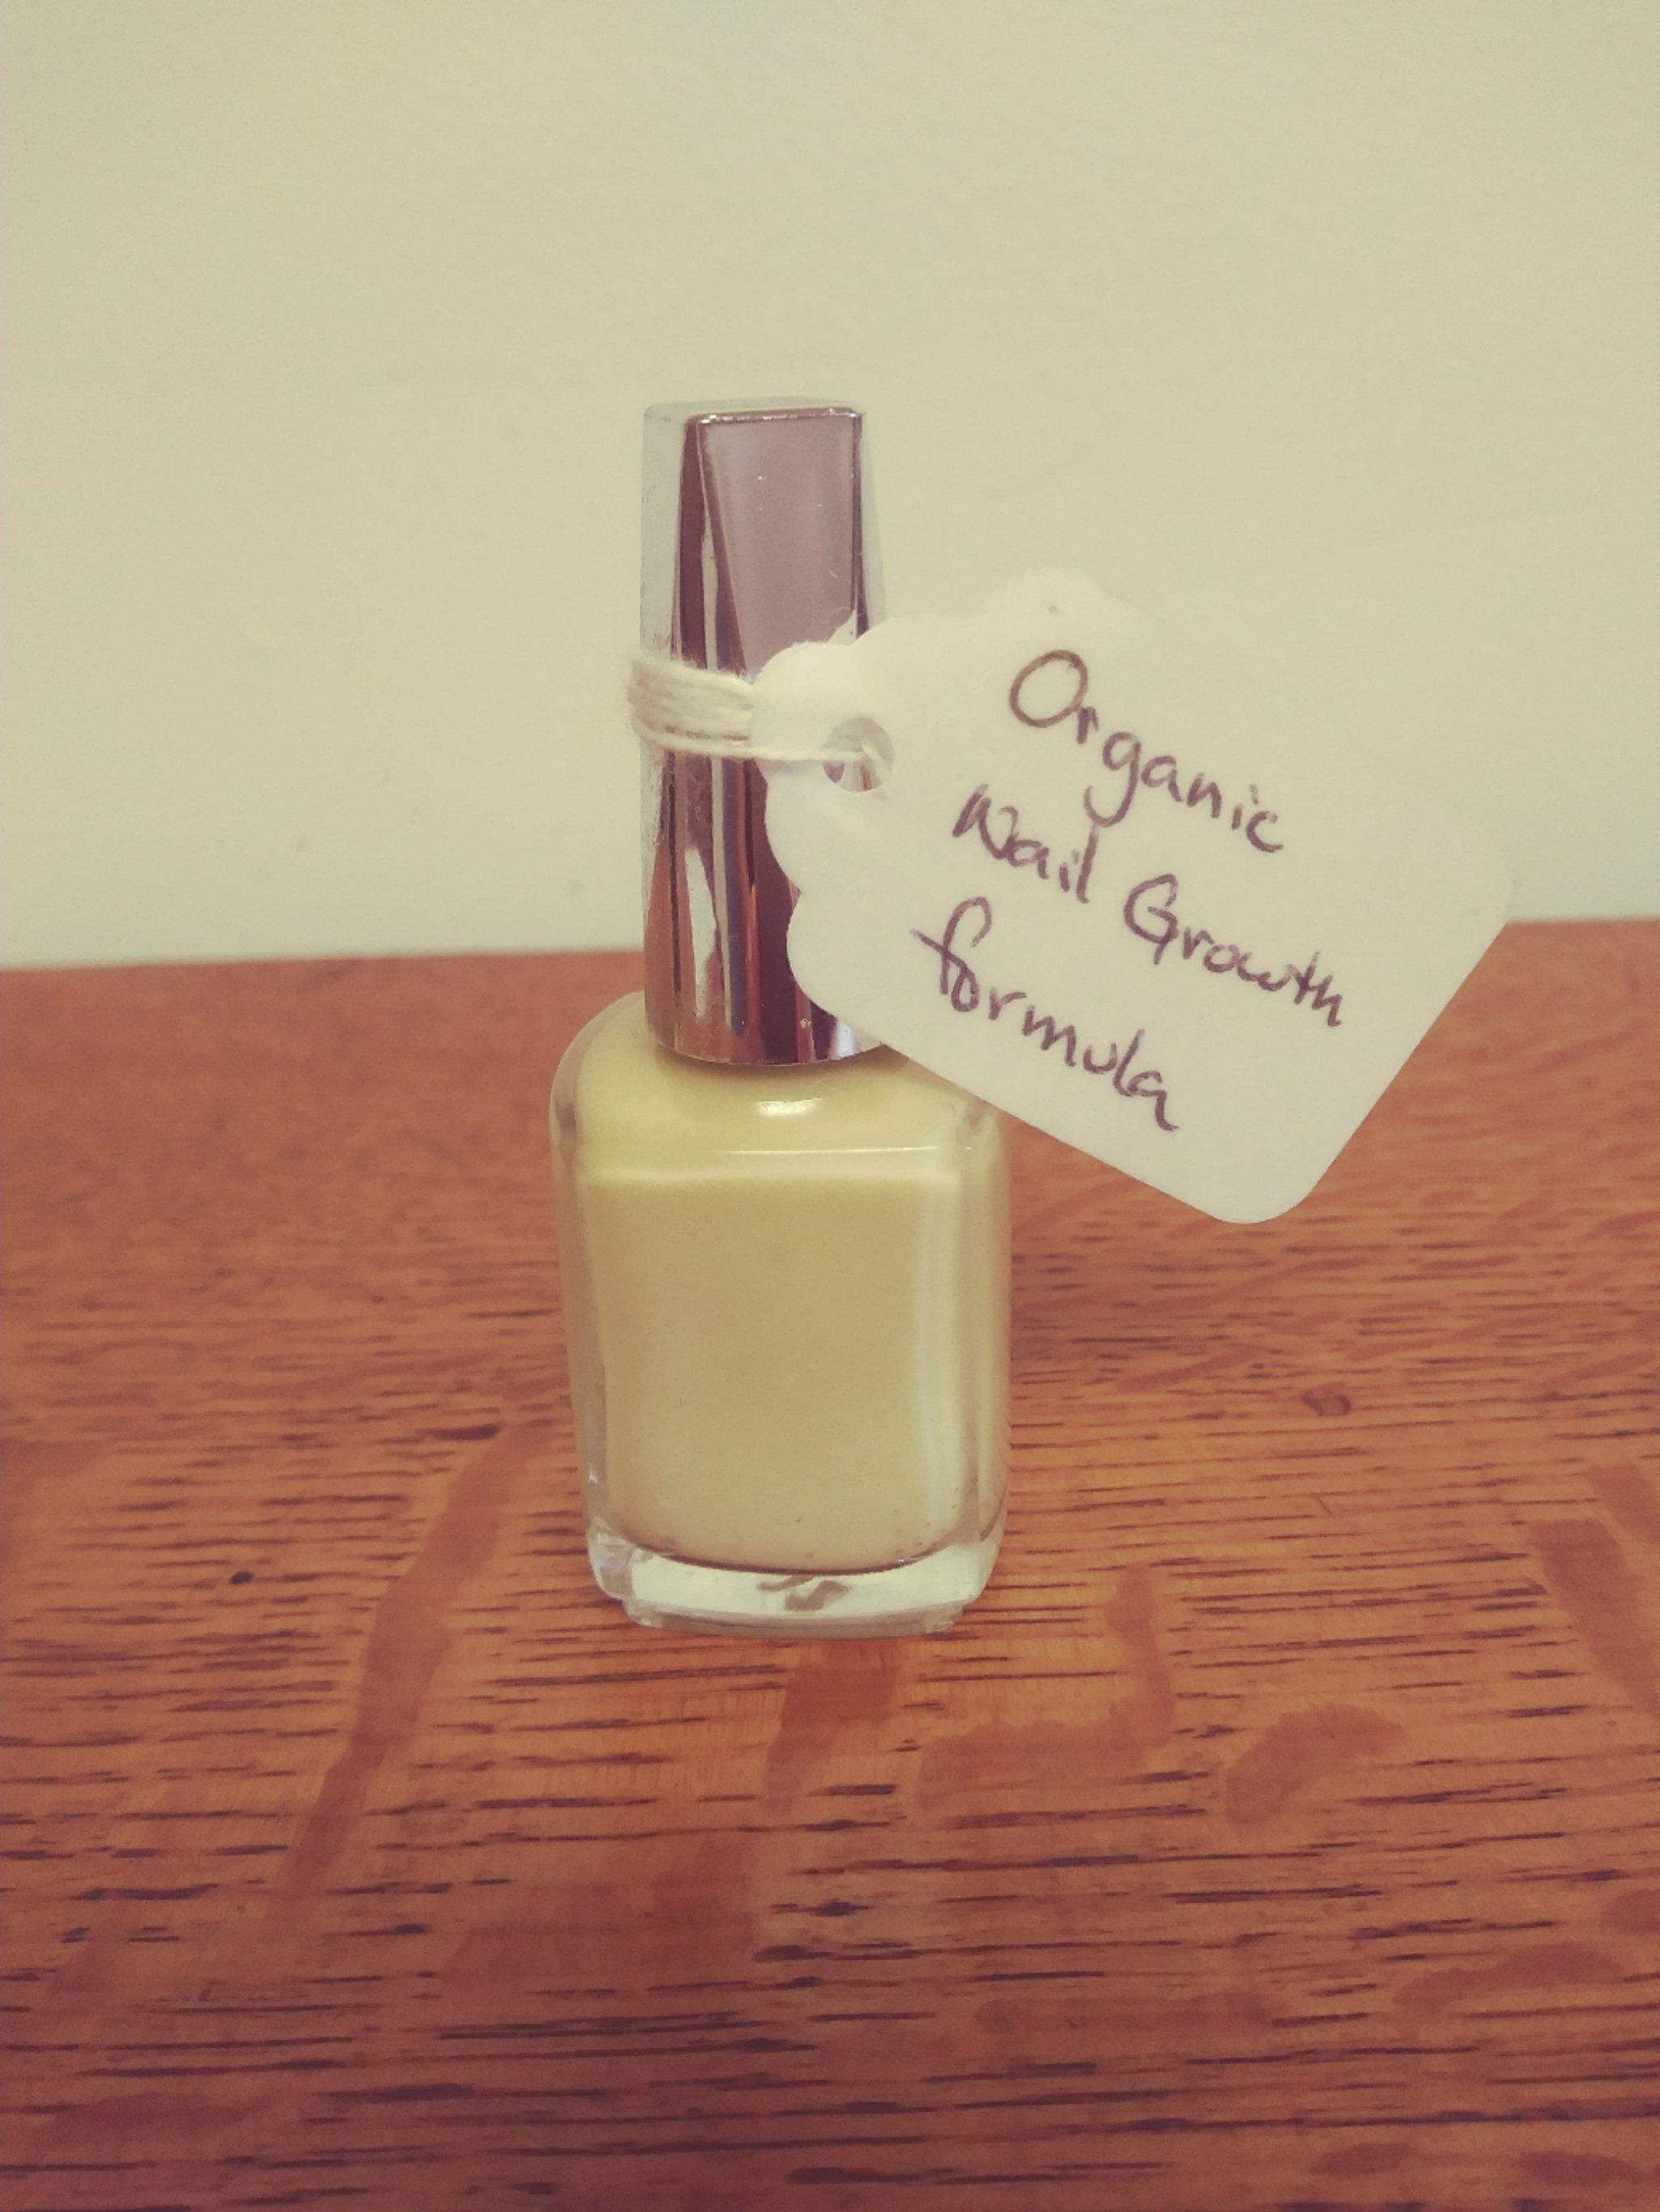 Organic nail growth formula | pachamamashc